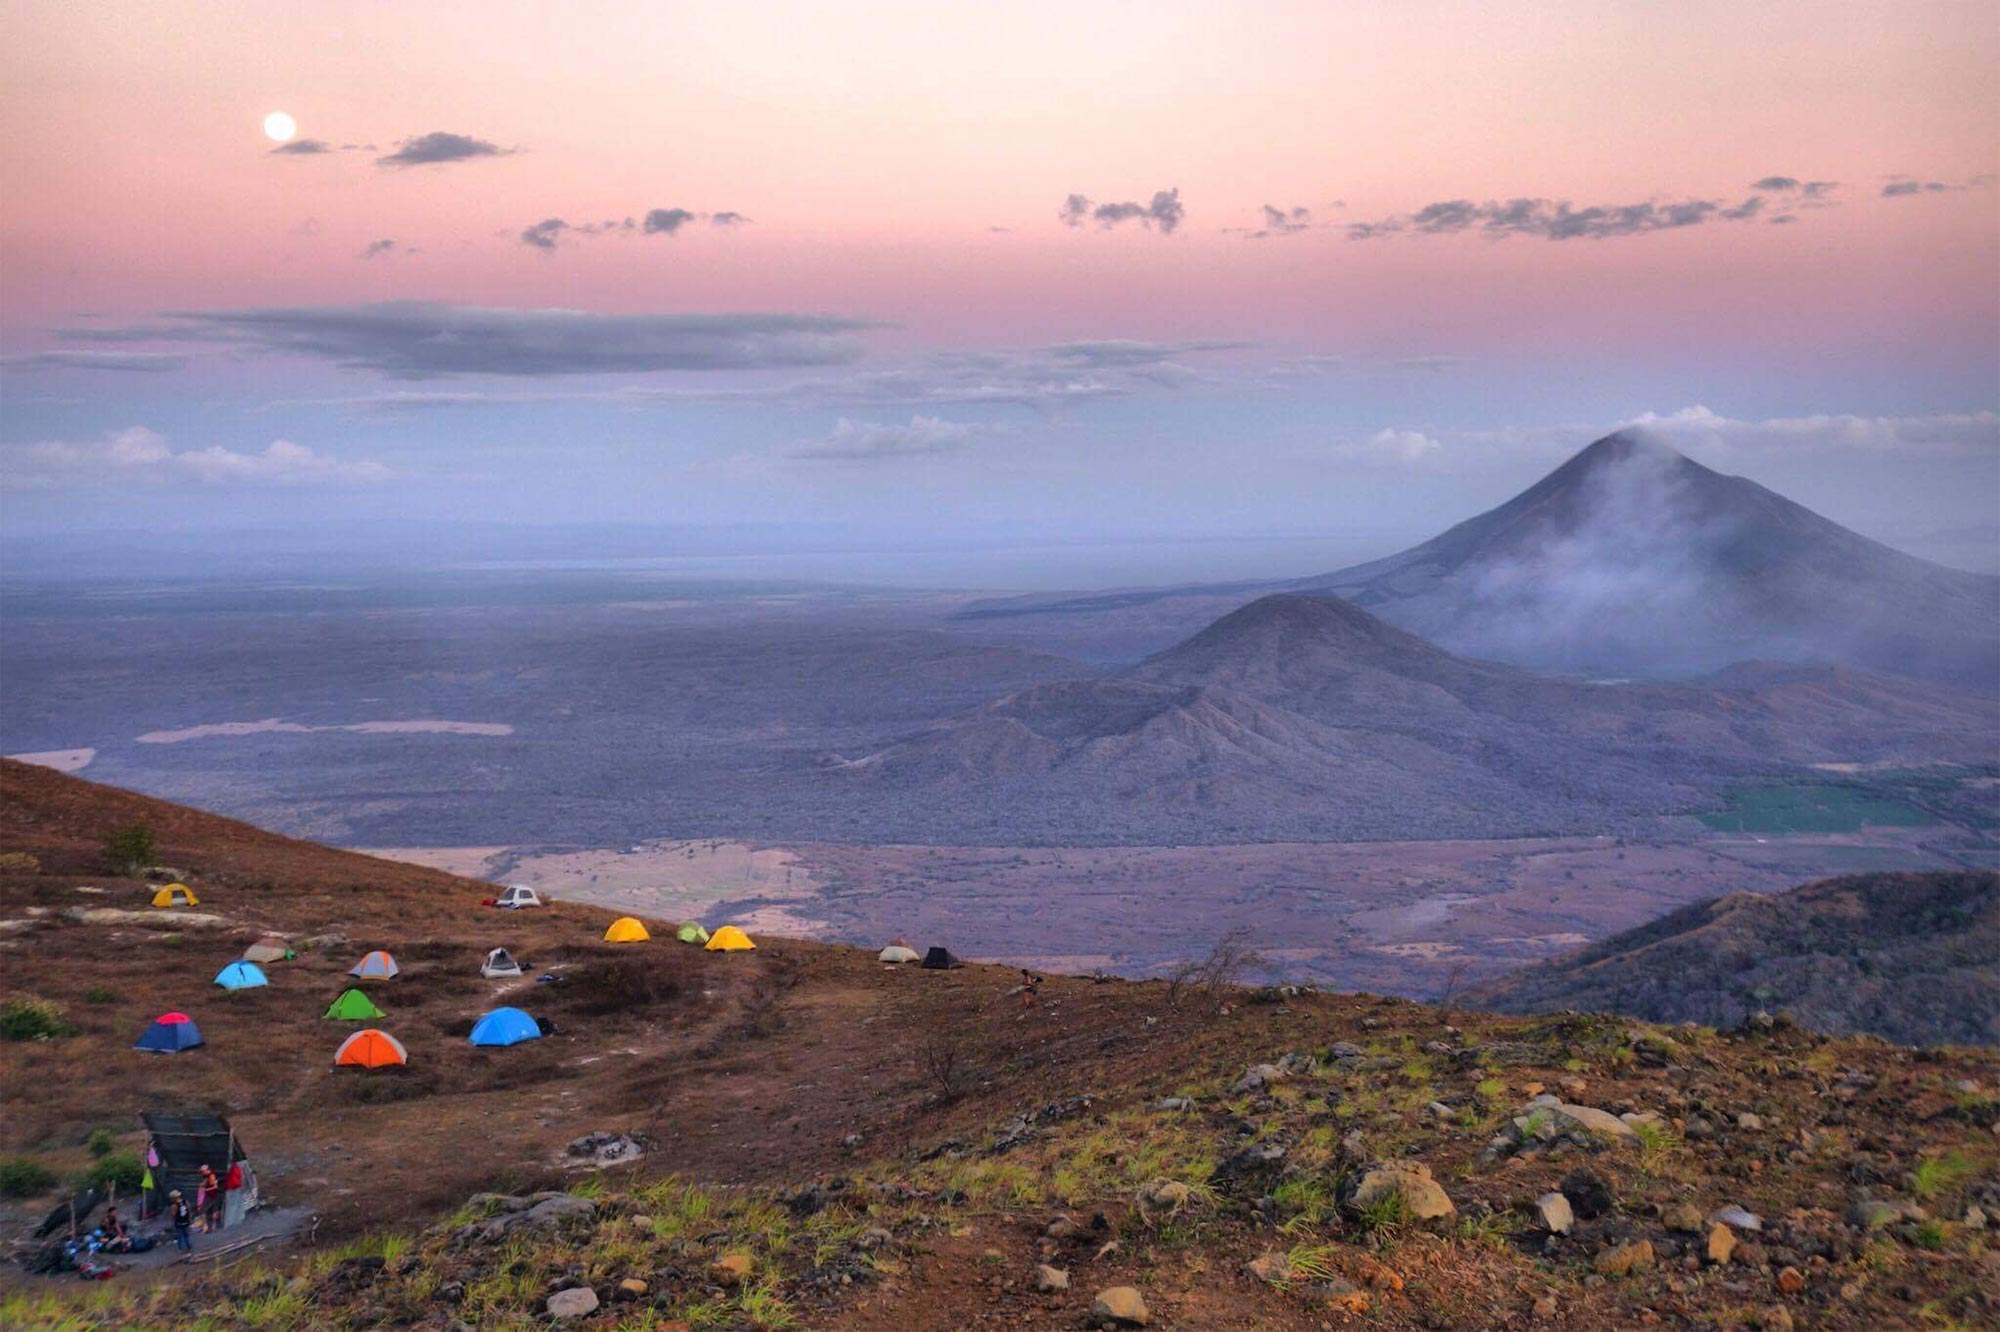 El Hoyo | Volcano hikes in Nicaragua